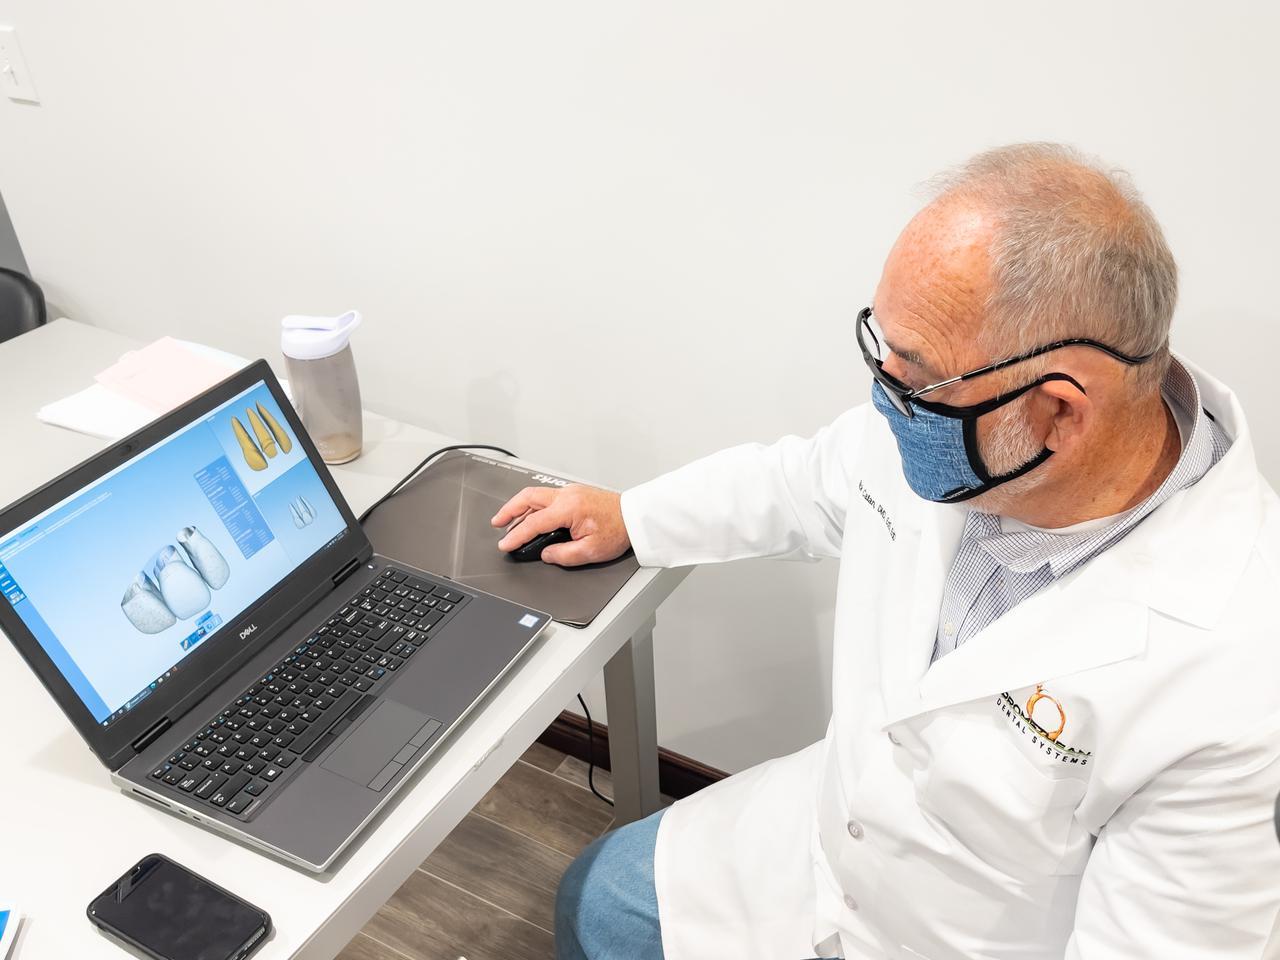 A dentist using his computer.